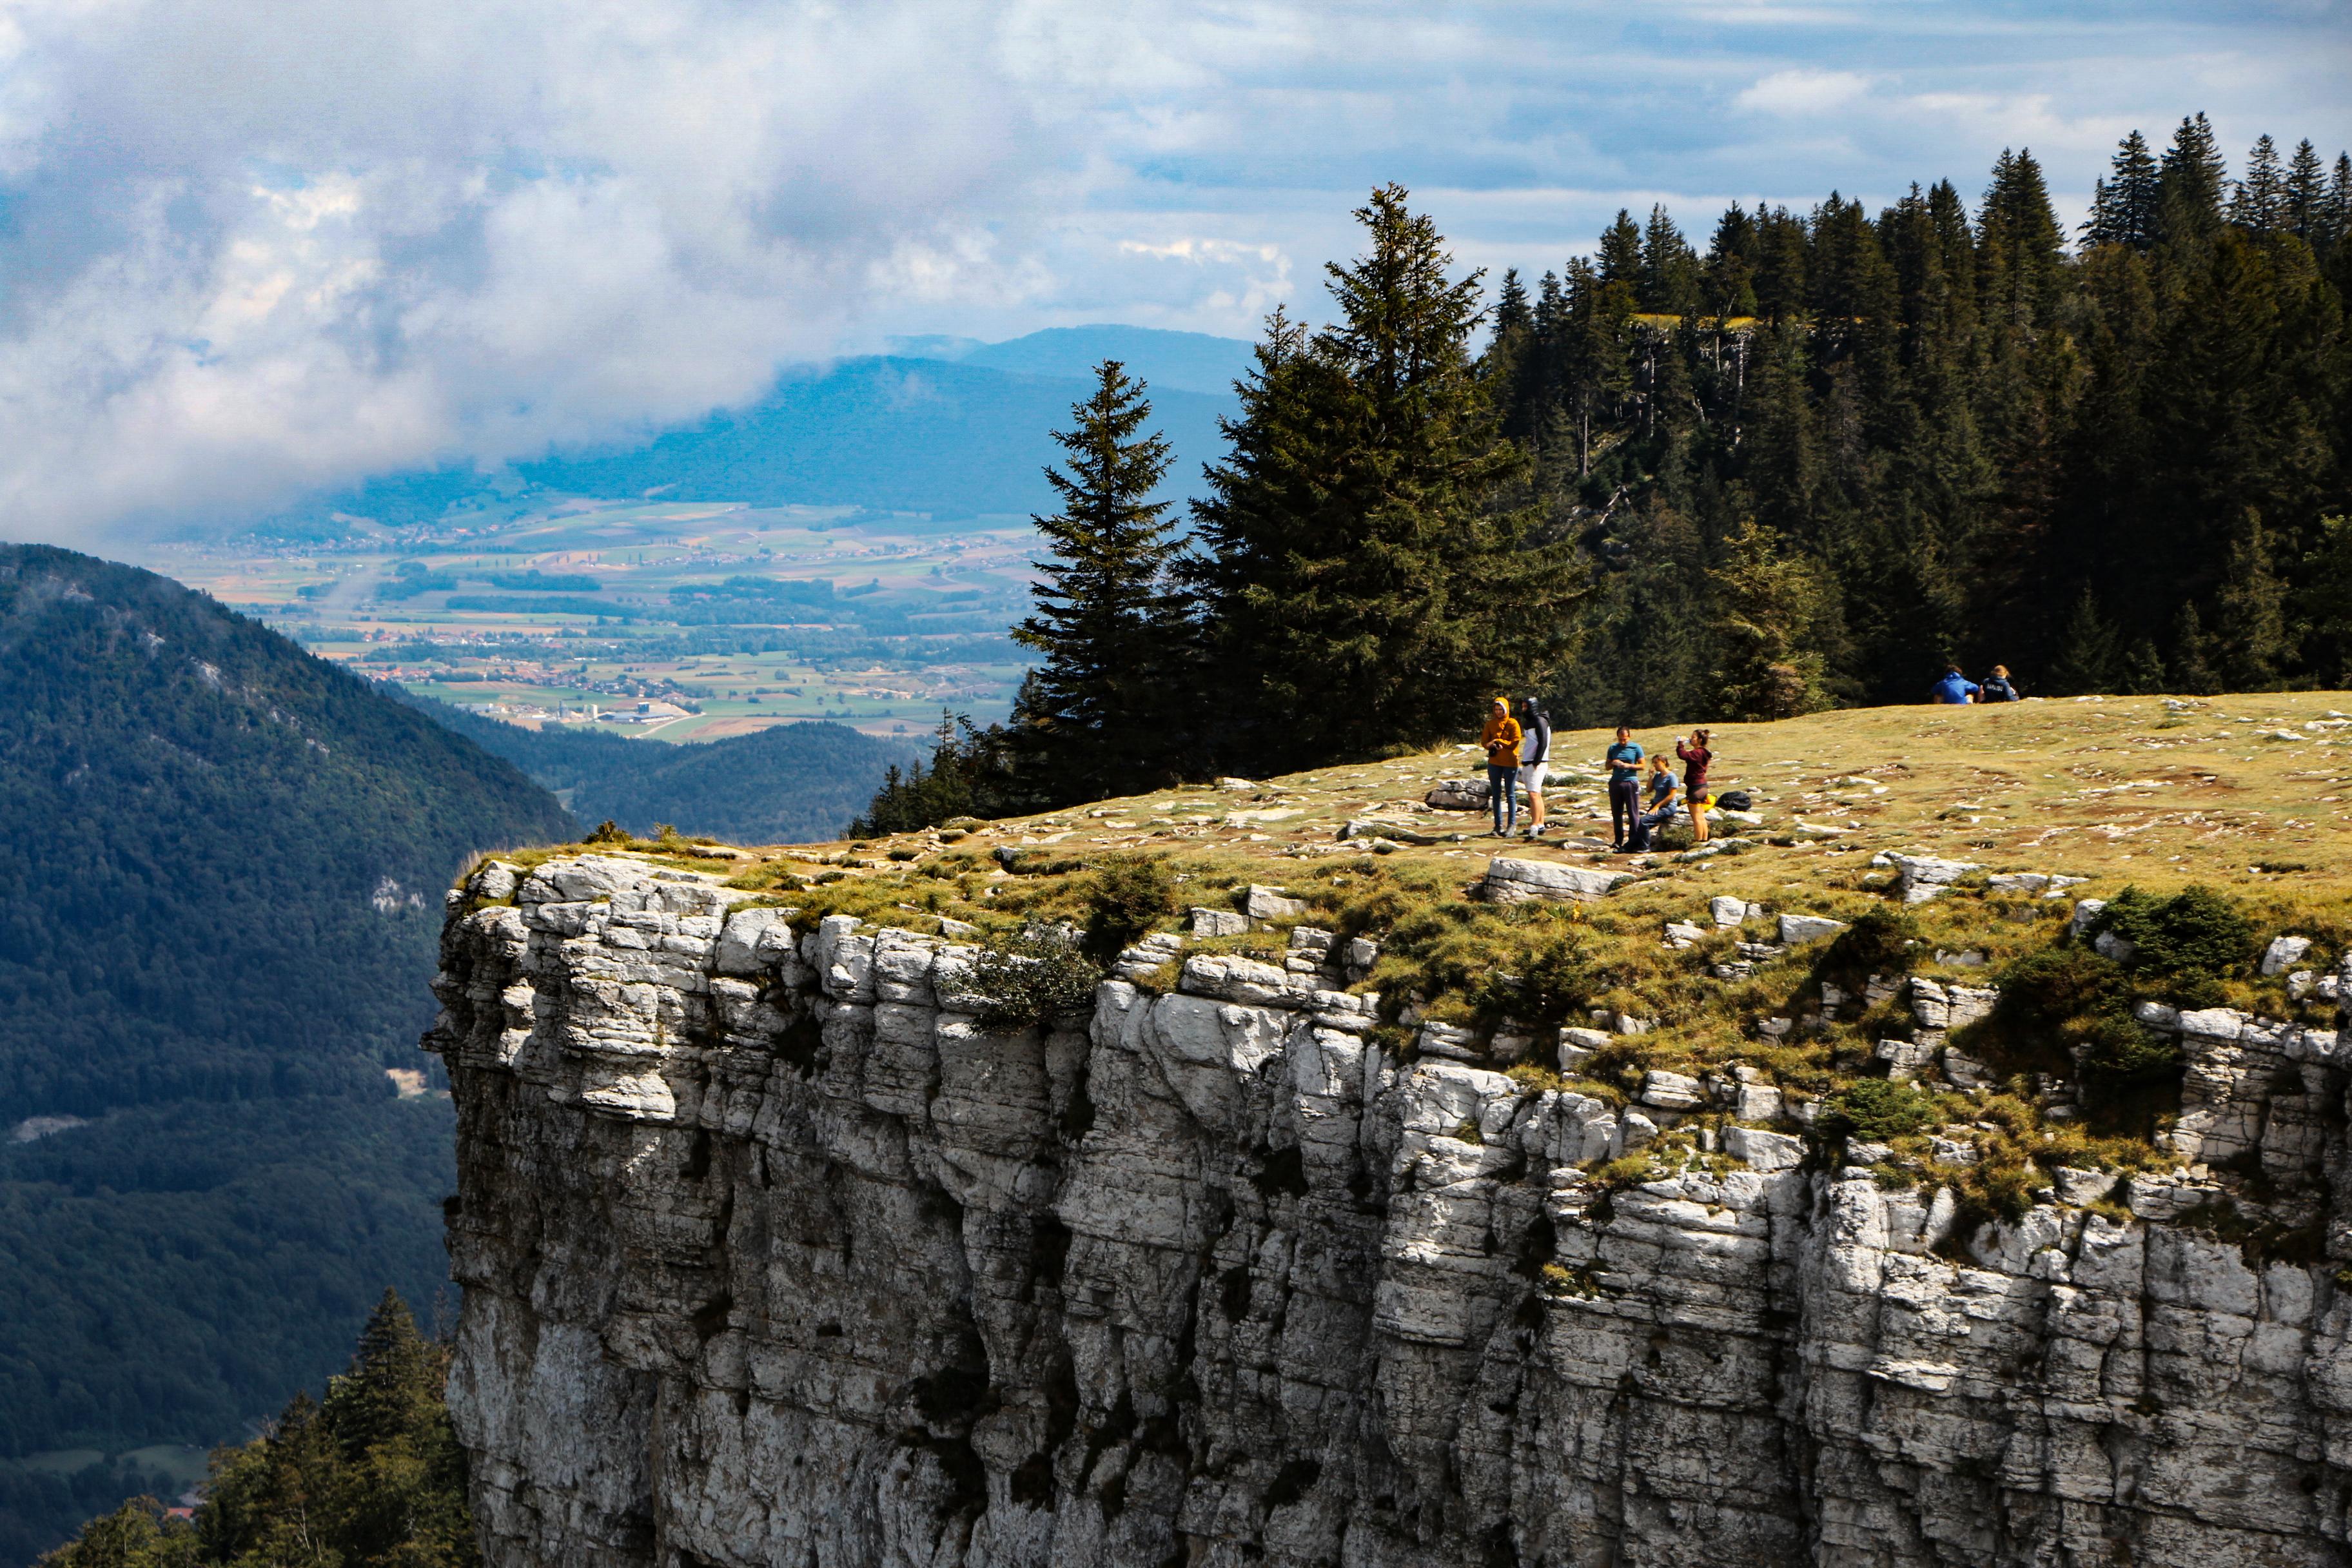 Creu du Van, Switzerland